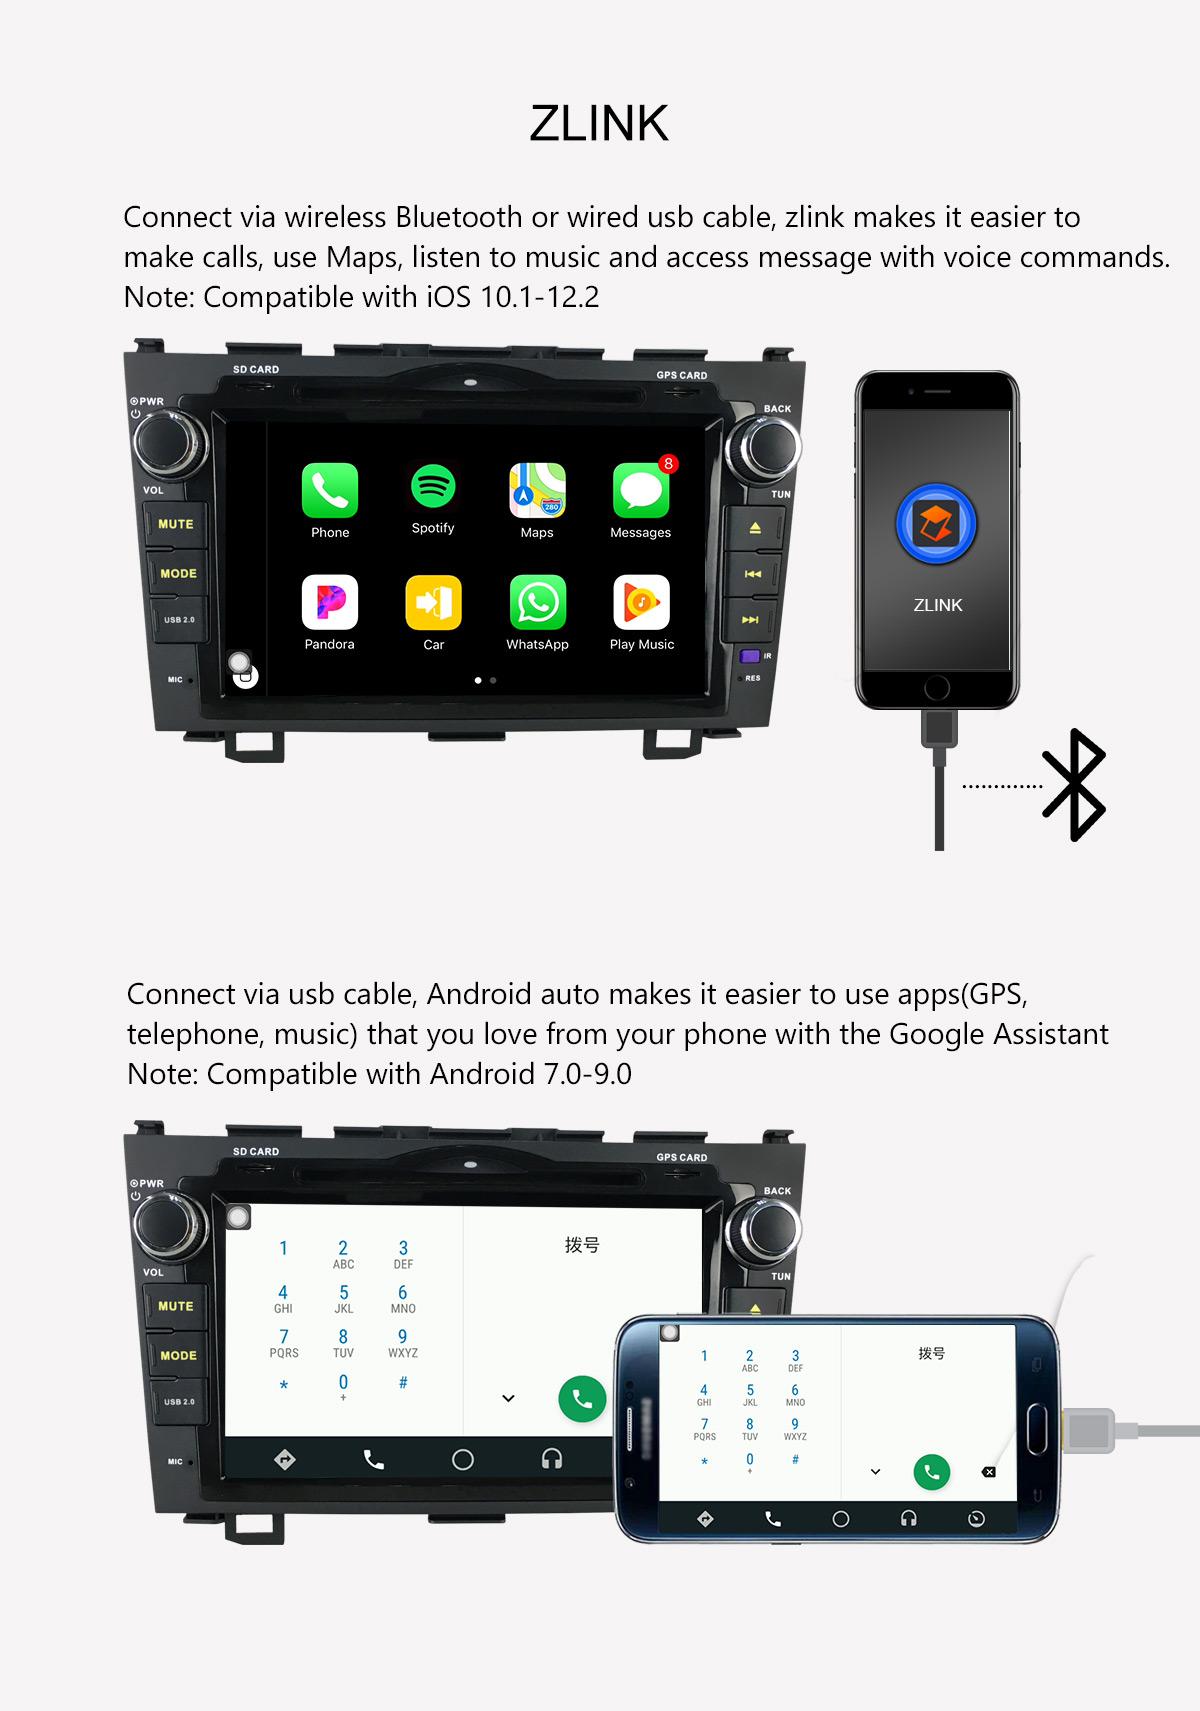 Joying 4G LTE Car Stereo Honda CRV Android 8 1 0 Head Unit Replacement  64GBRAM